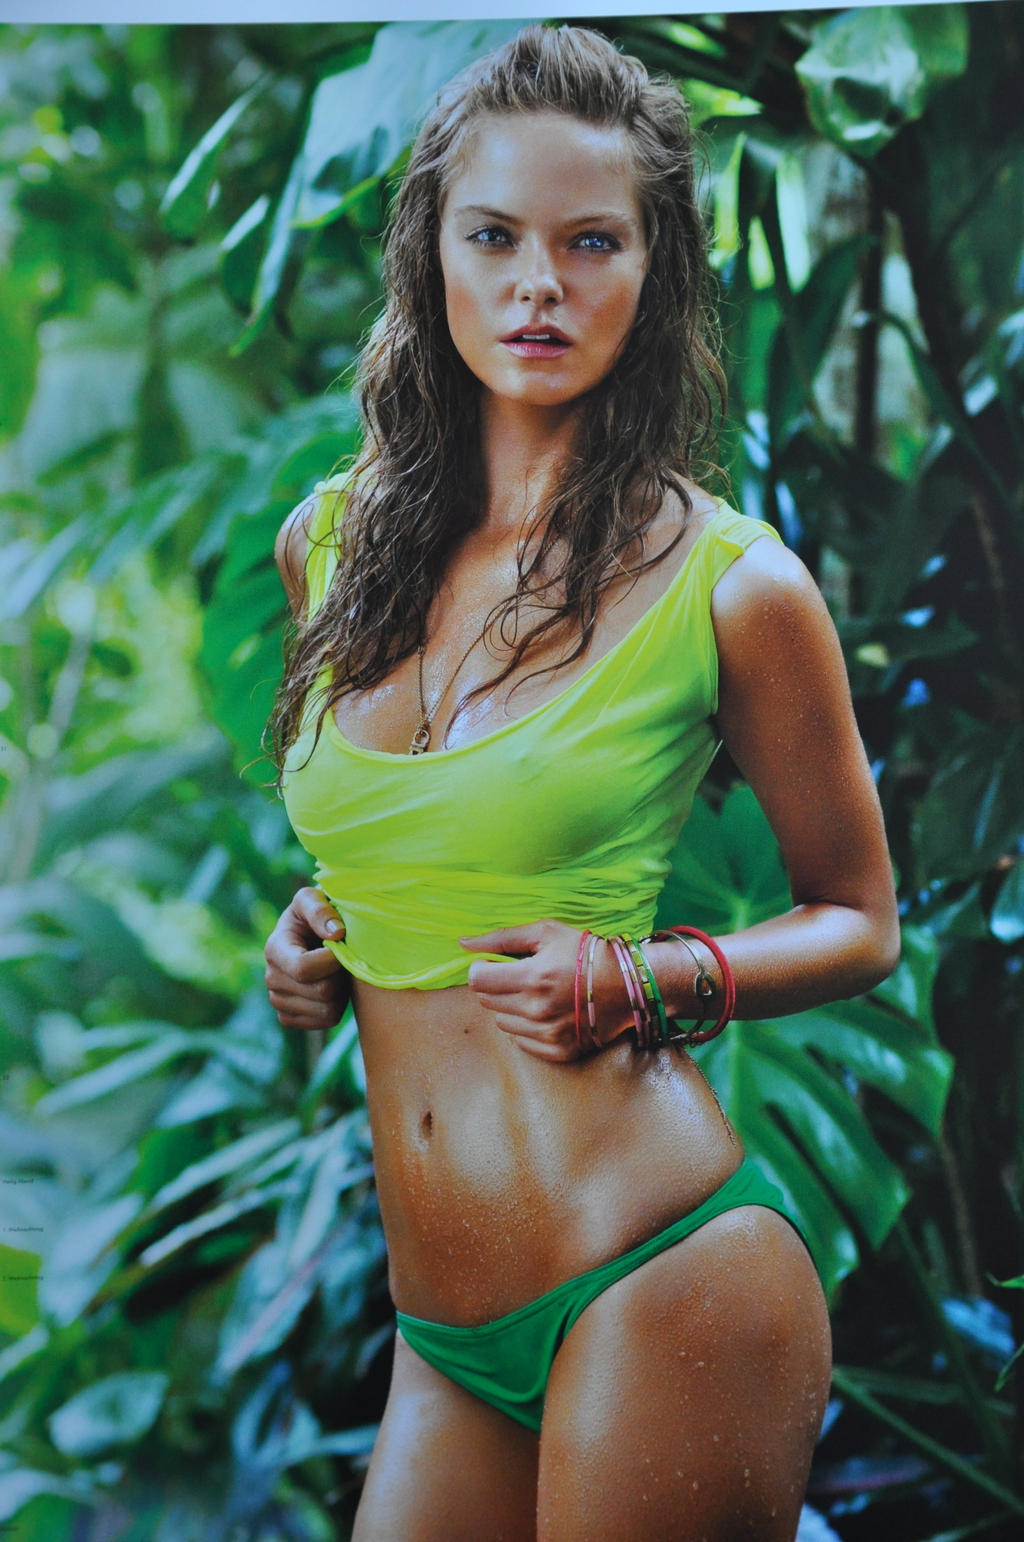 Jessica Perez Wuerth Calendar 2014 by nobii on DeviantArt